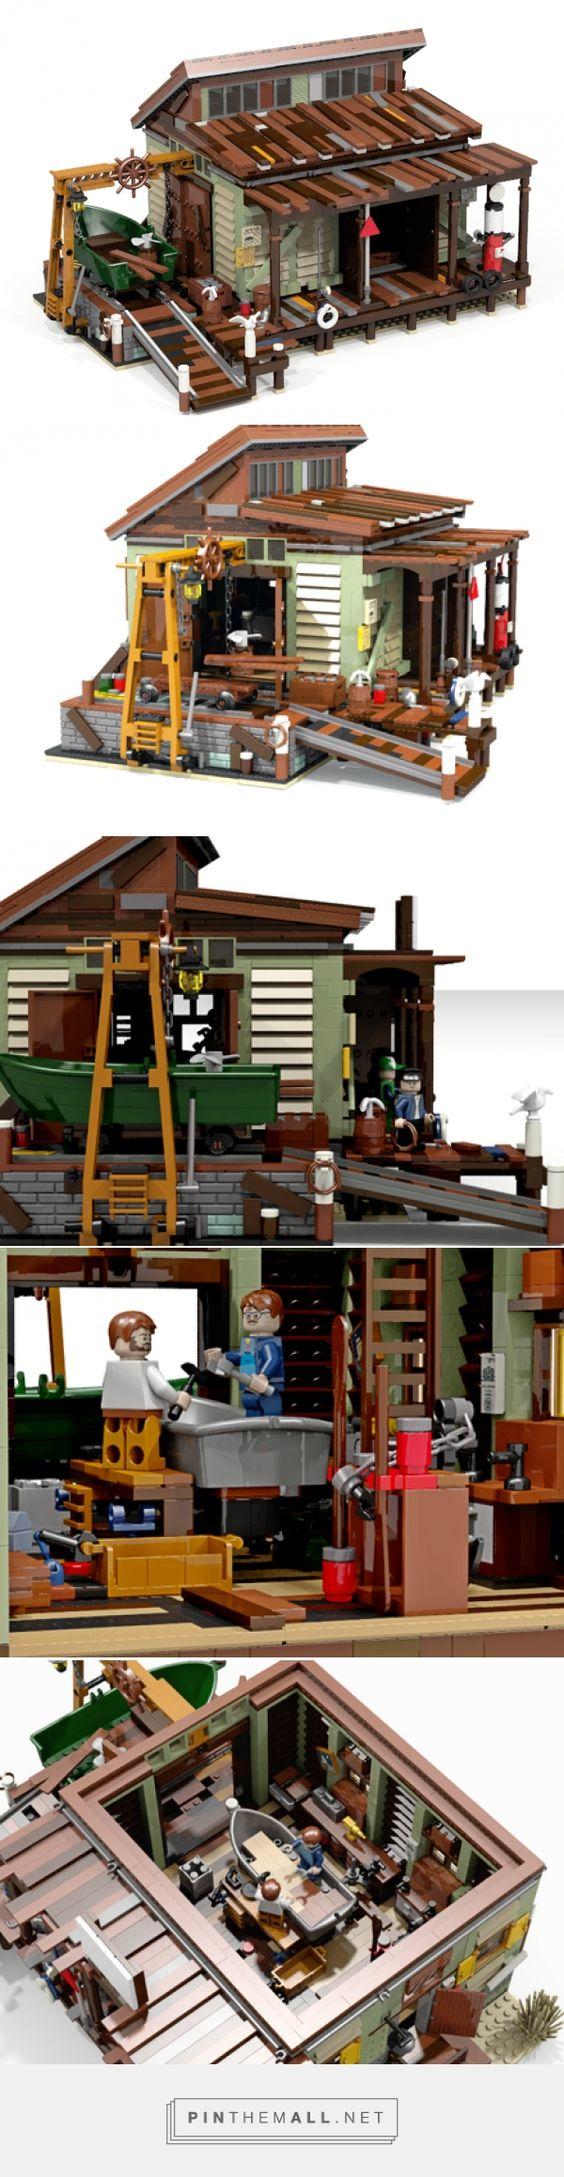 LEGO Ideas - Boat Repair Shop - created via https://pinthemall.net